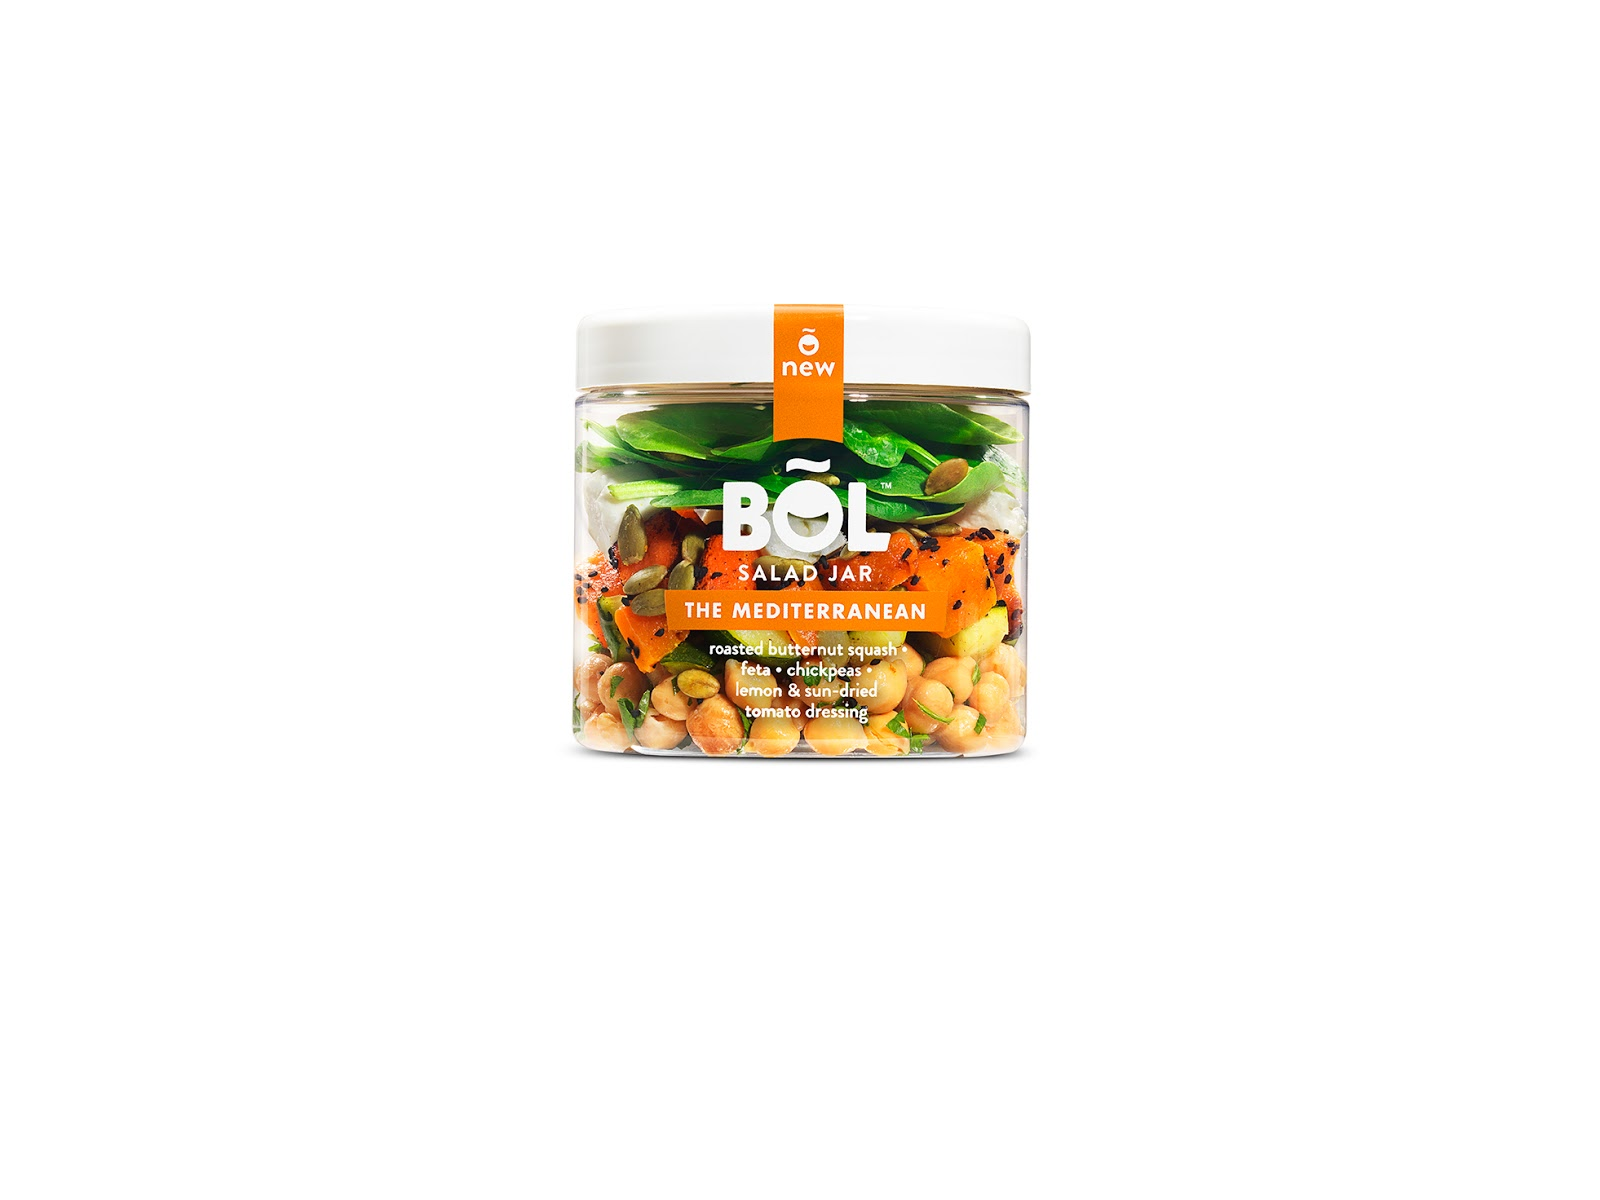 Bol Salad Jars Where To Buy